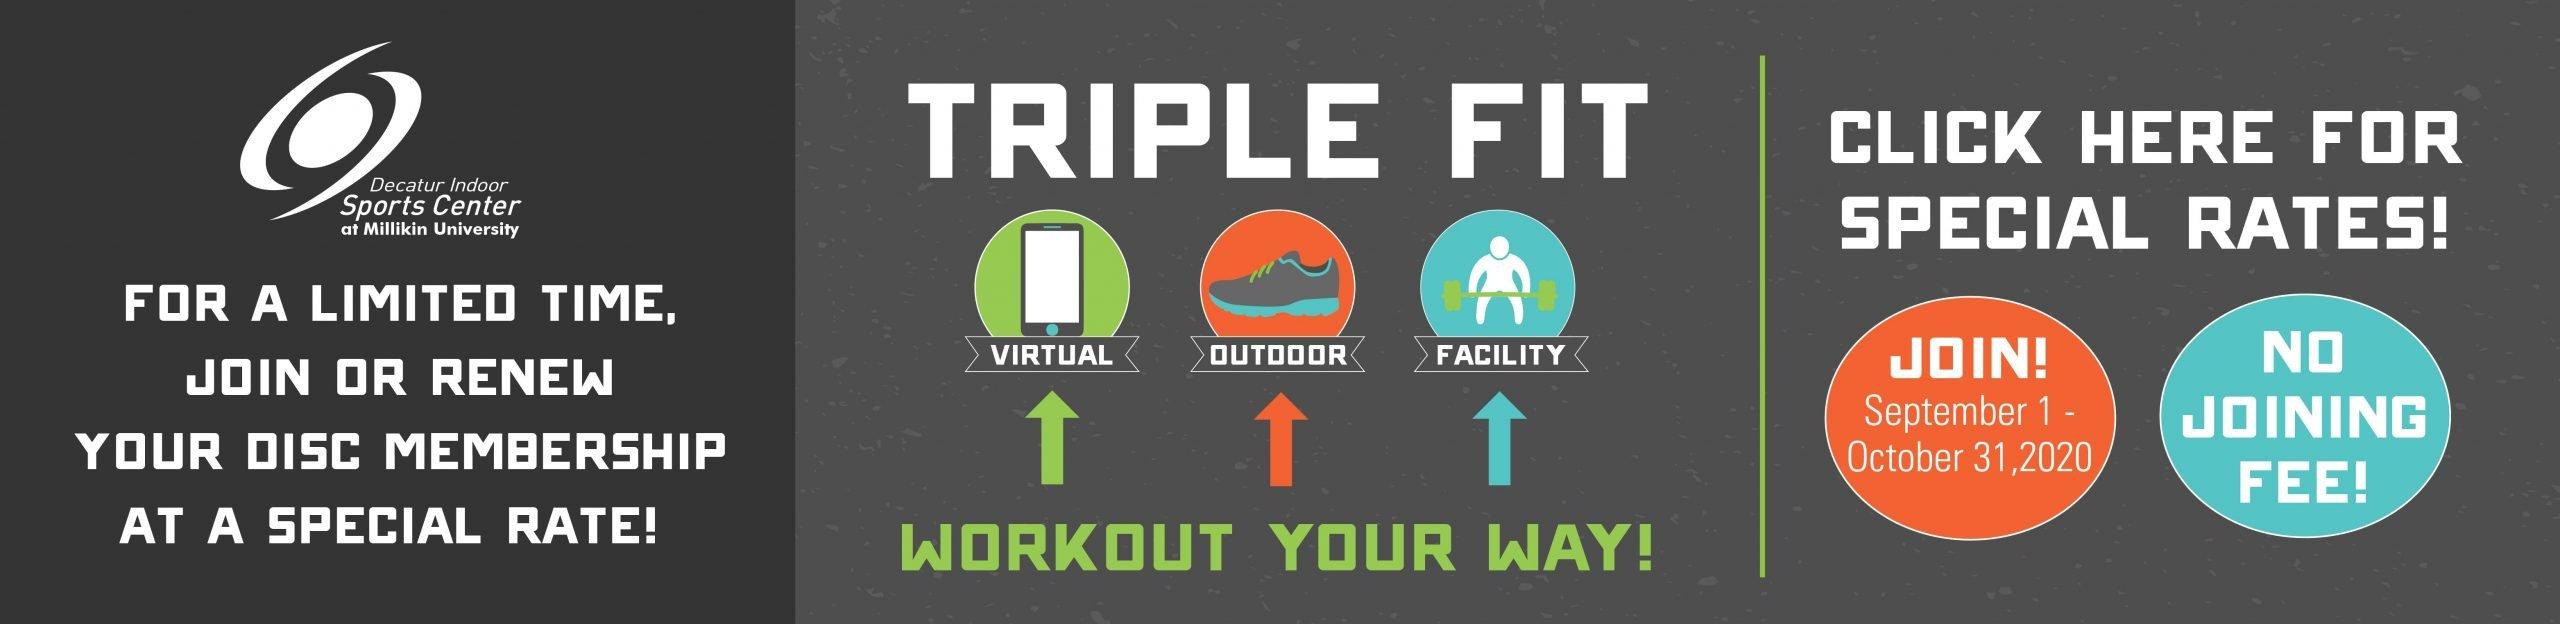 TripleFit_2020-01